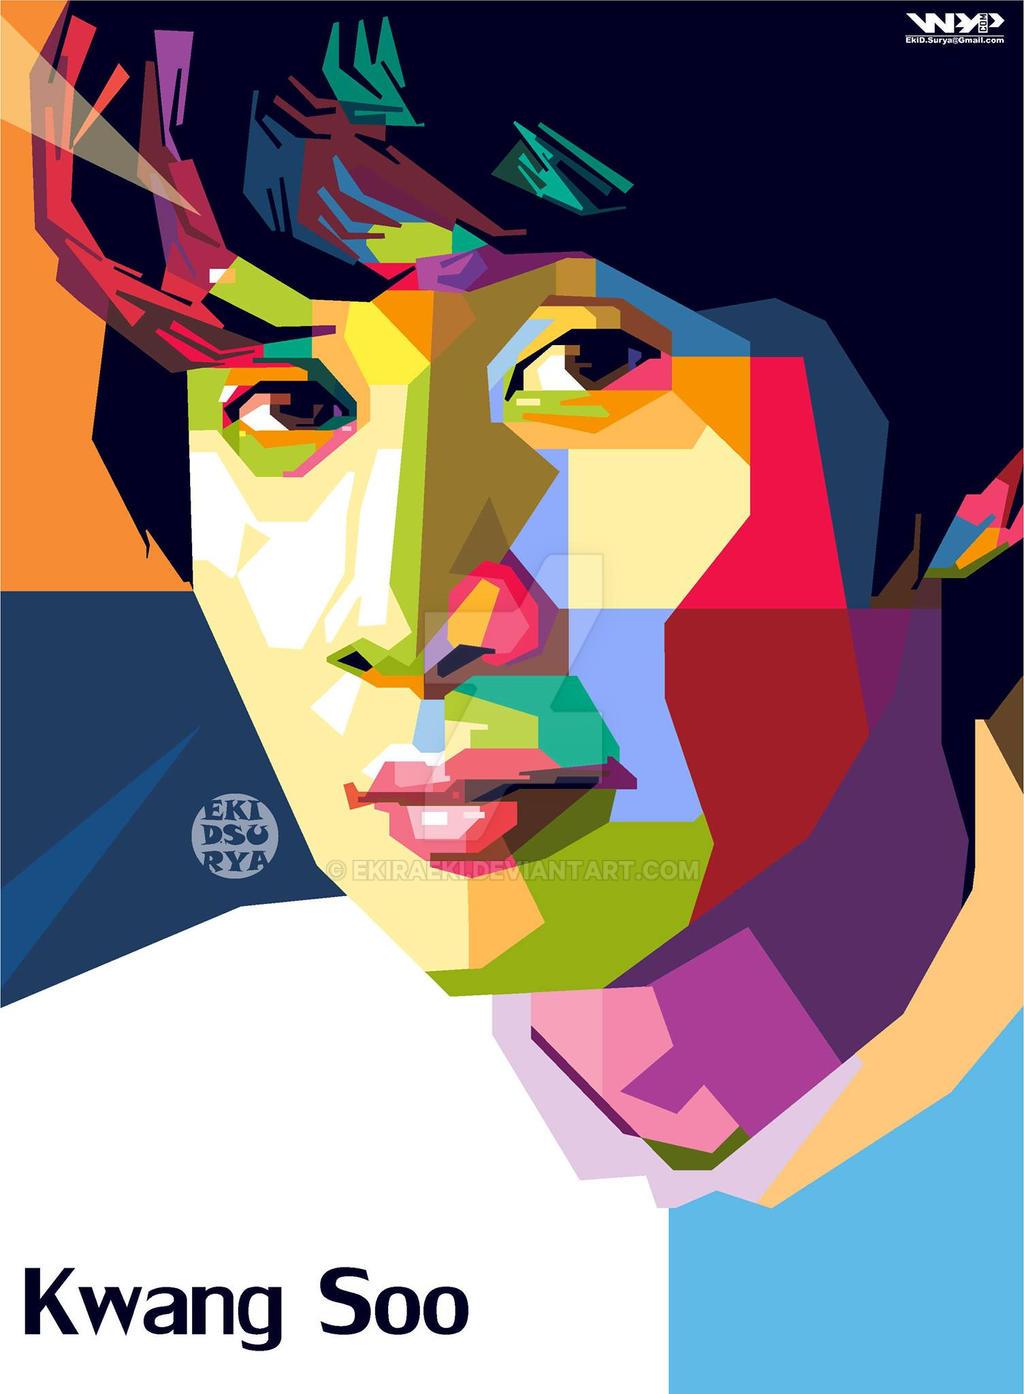 WPAP Lee Kwang Soo Running Man By EKIRAeki